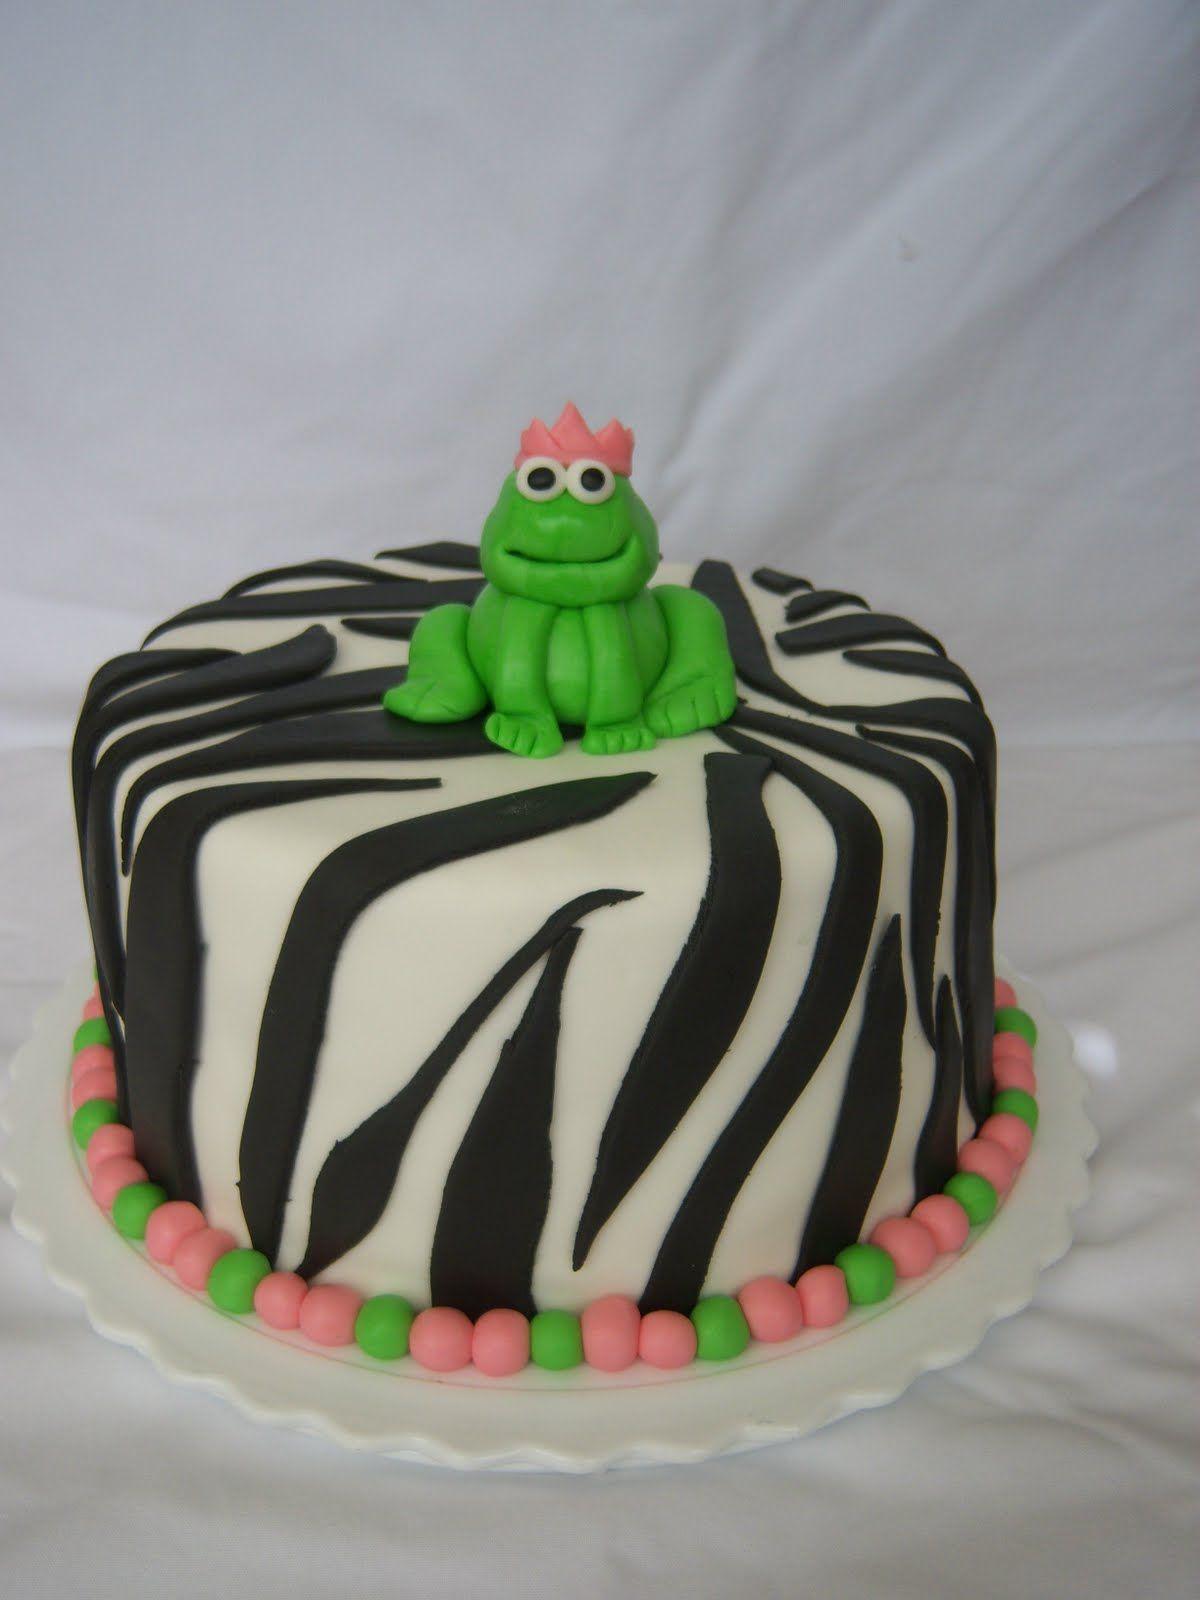 Frog Birthday Cake Ideas Creative Cakes By Angela Zebra And Frog